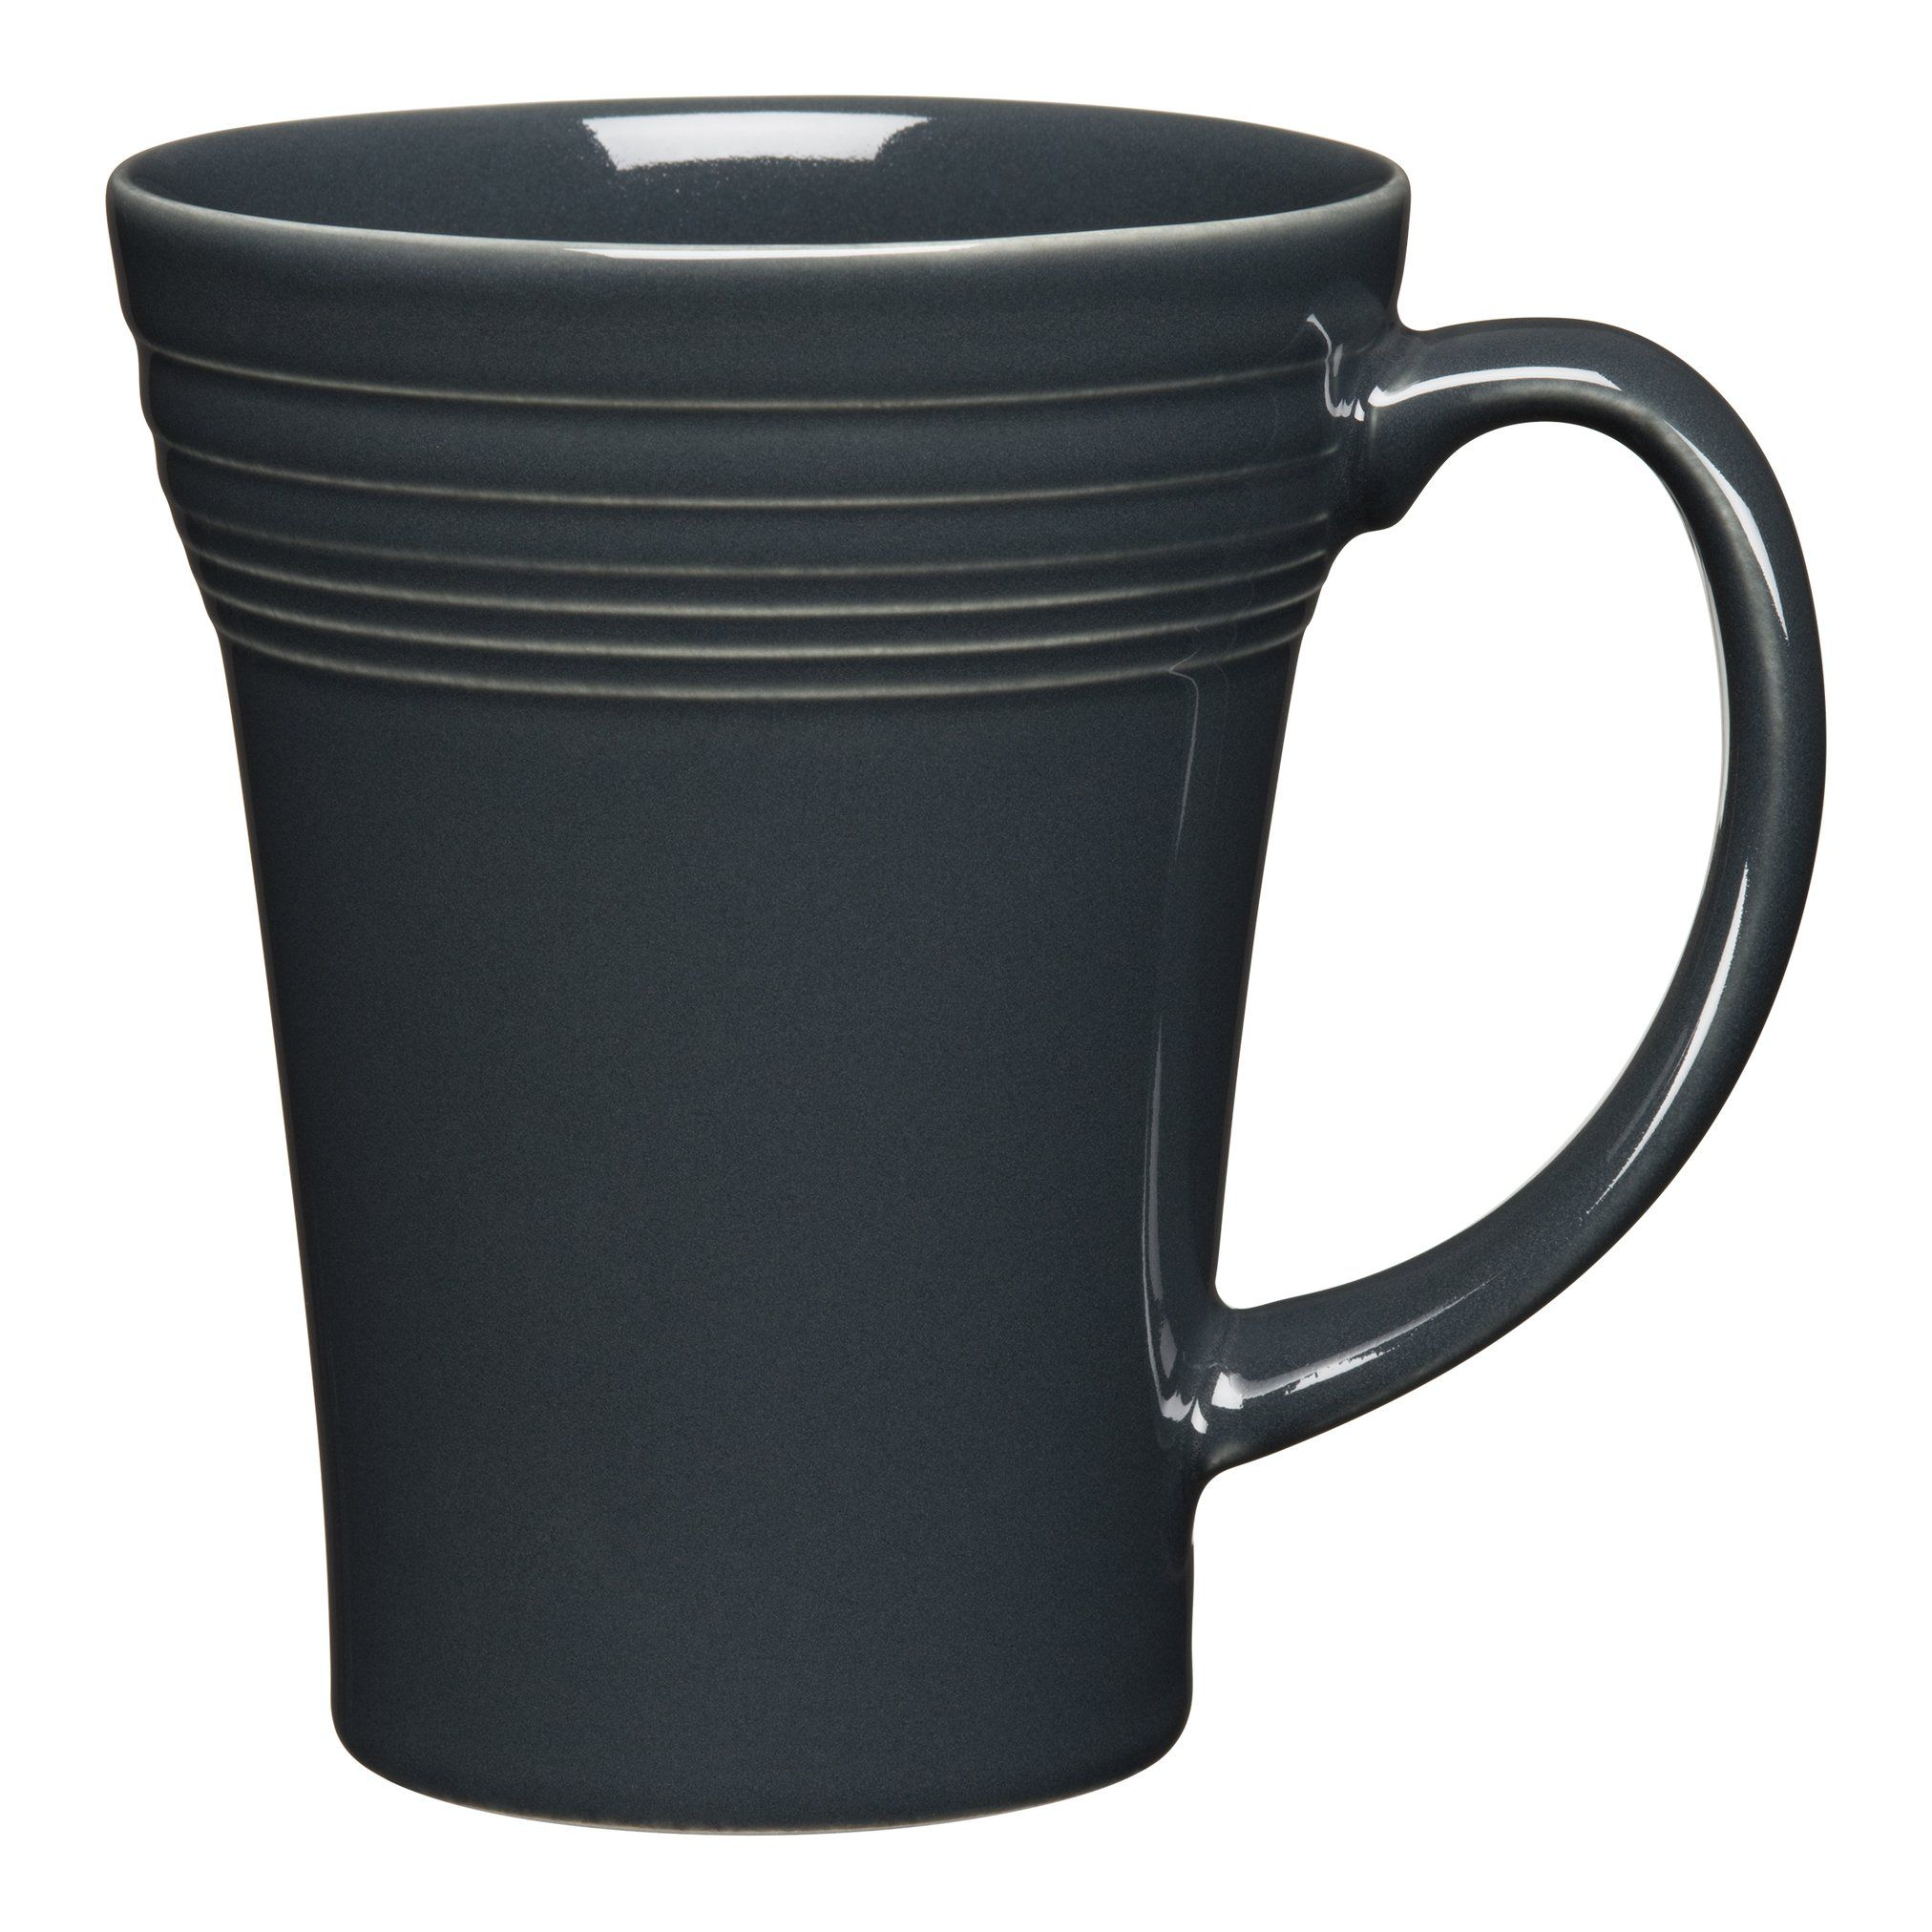 ddce27d9d8eb9 Fiesta® Dinnerware Slate Bistro Latte Mug made by Homer Laughlin China  Company